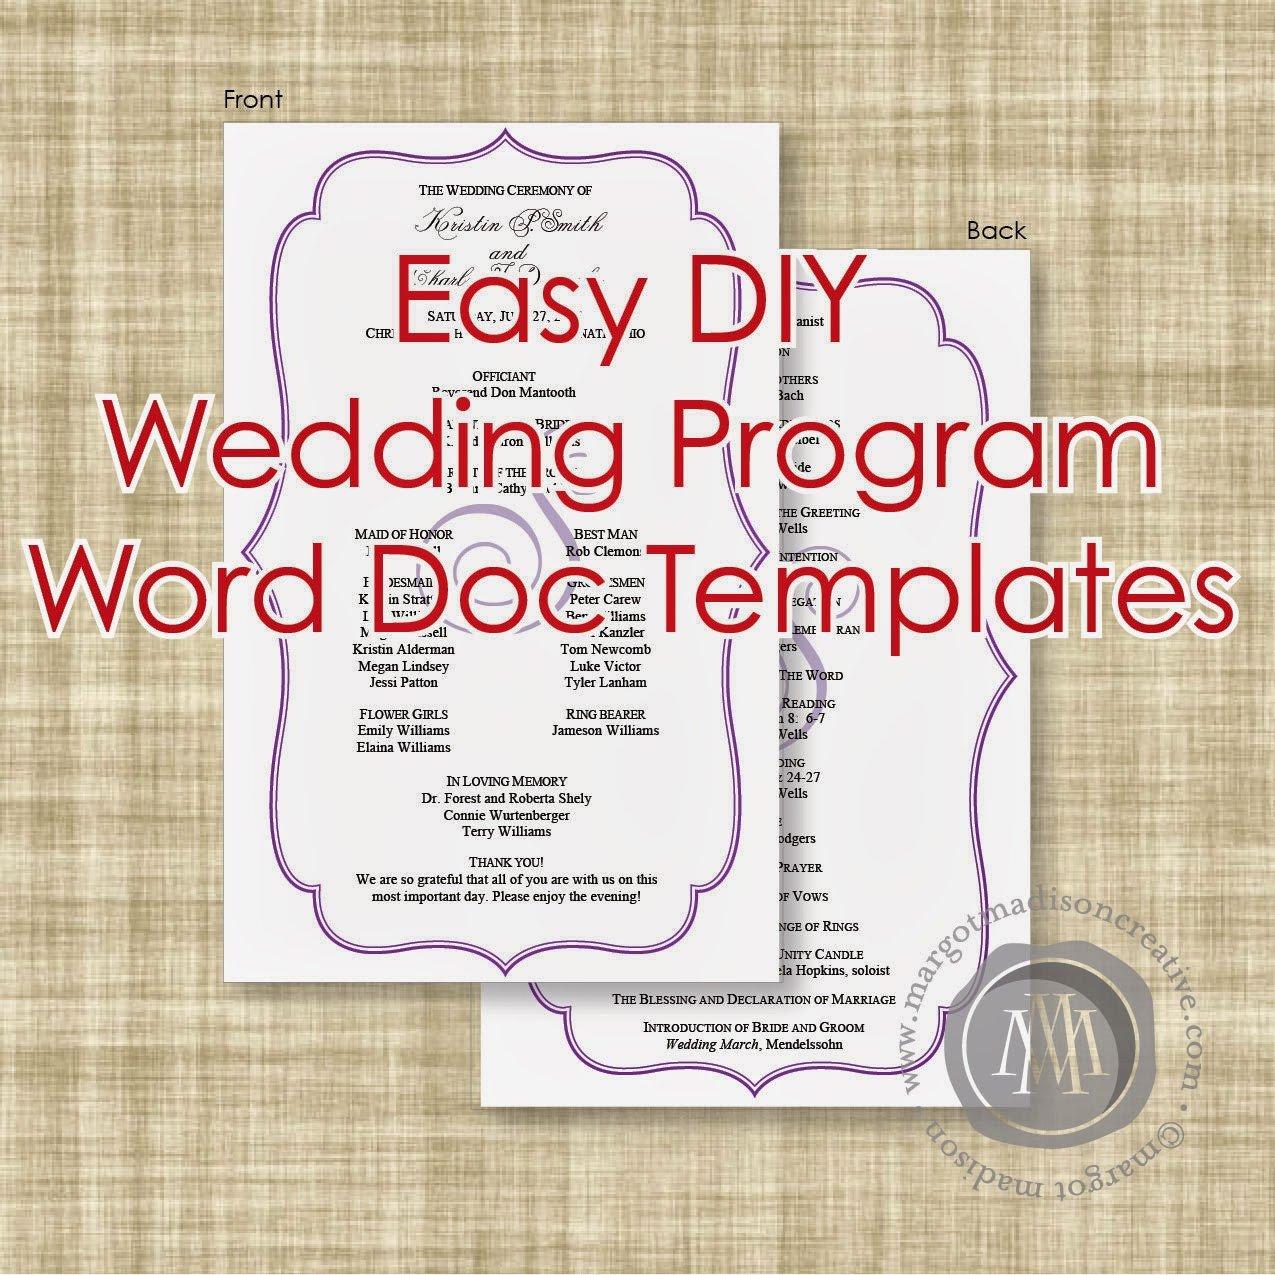 MargotMadison DIY Wedding Program Word Doc Templates now